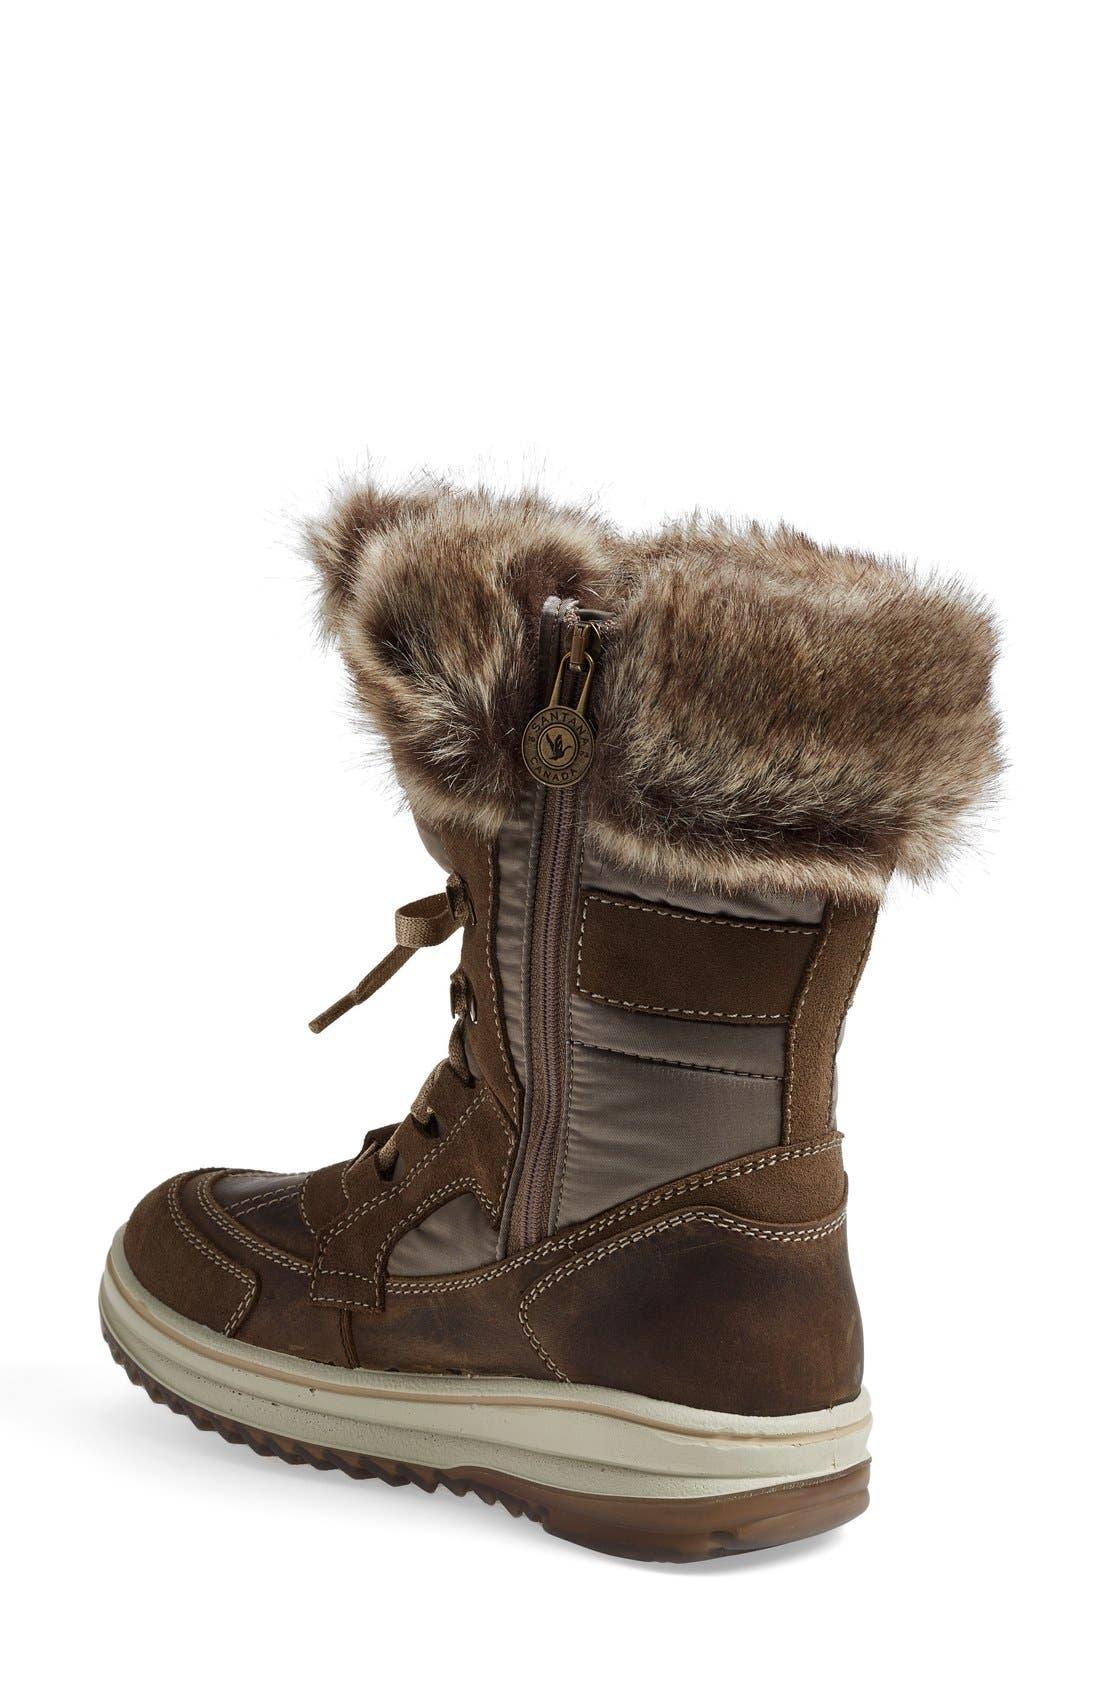 Alternate Image 2  - Santana Canada 'Marta' Water Resistant Insulated Winter Boot (Women)